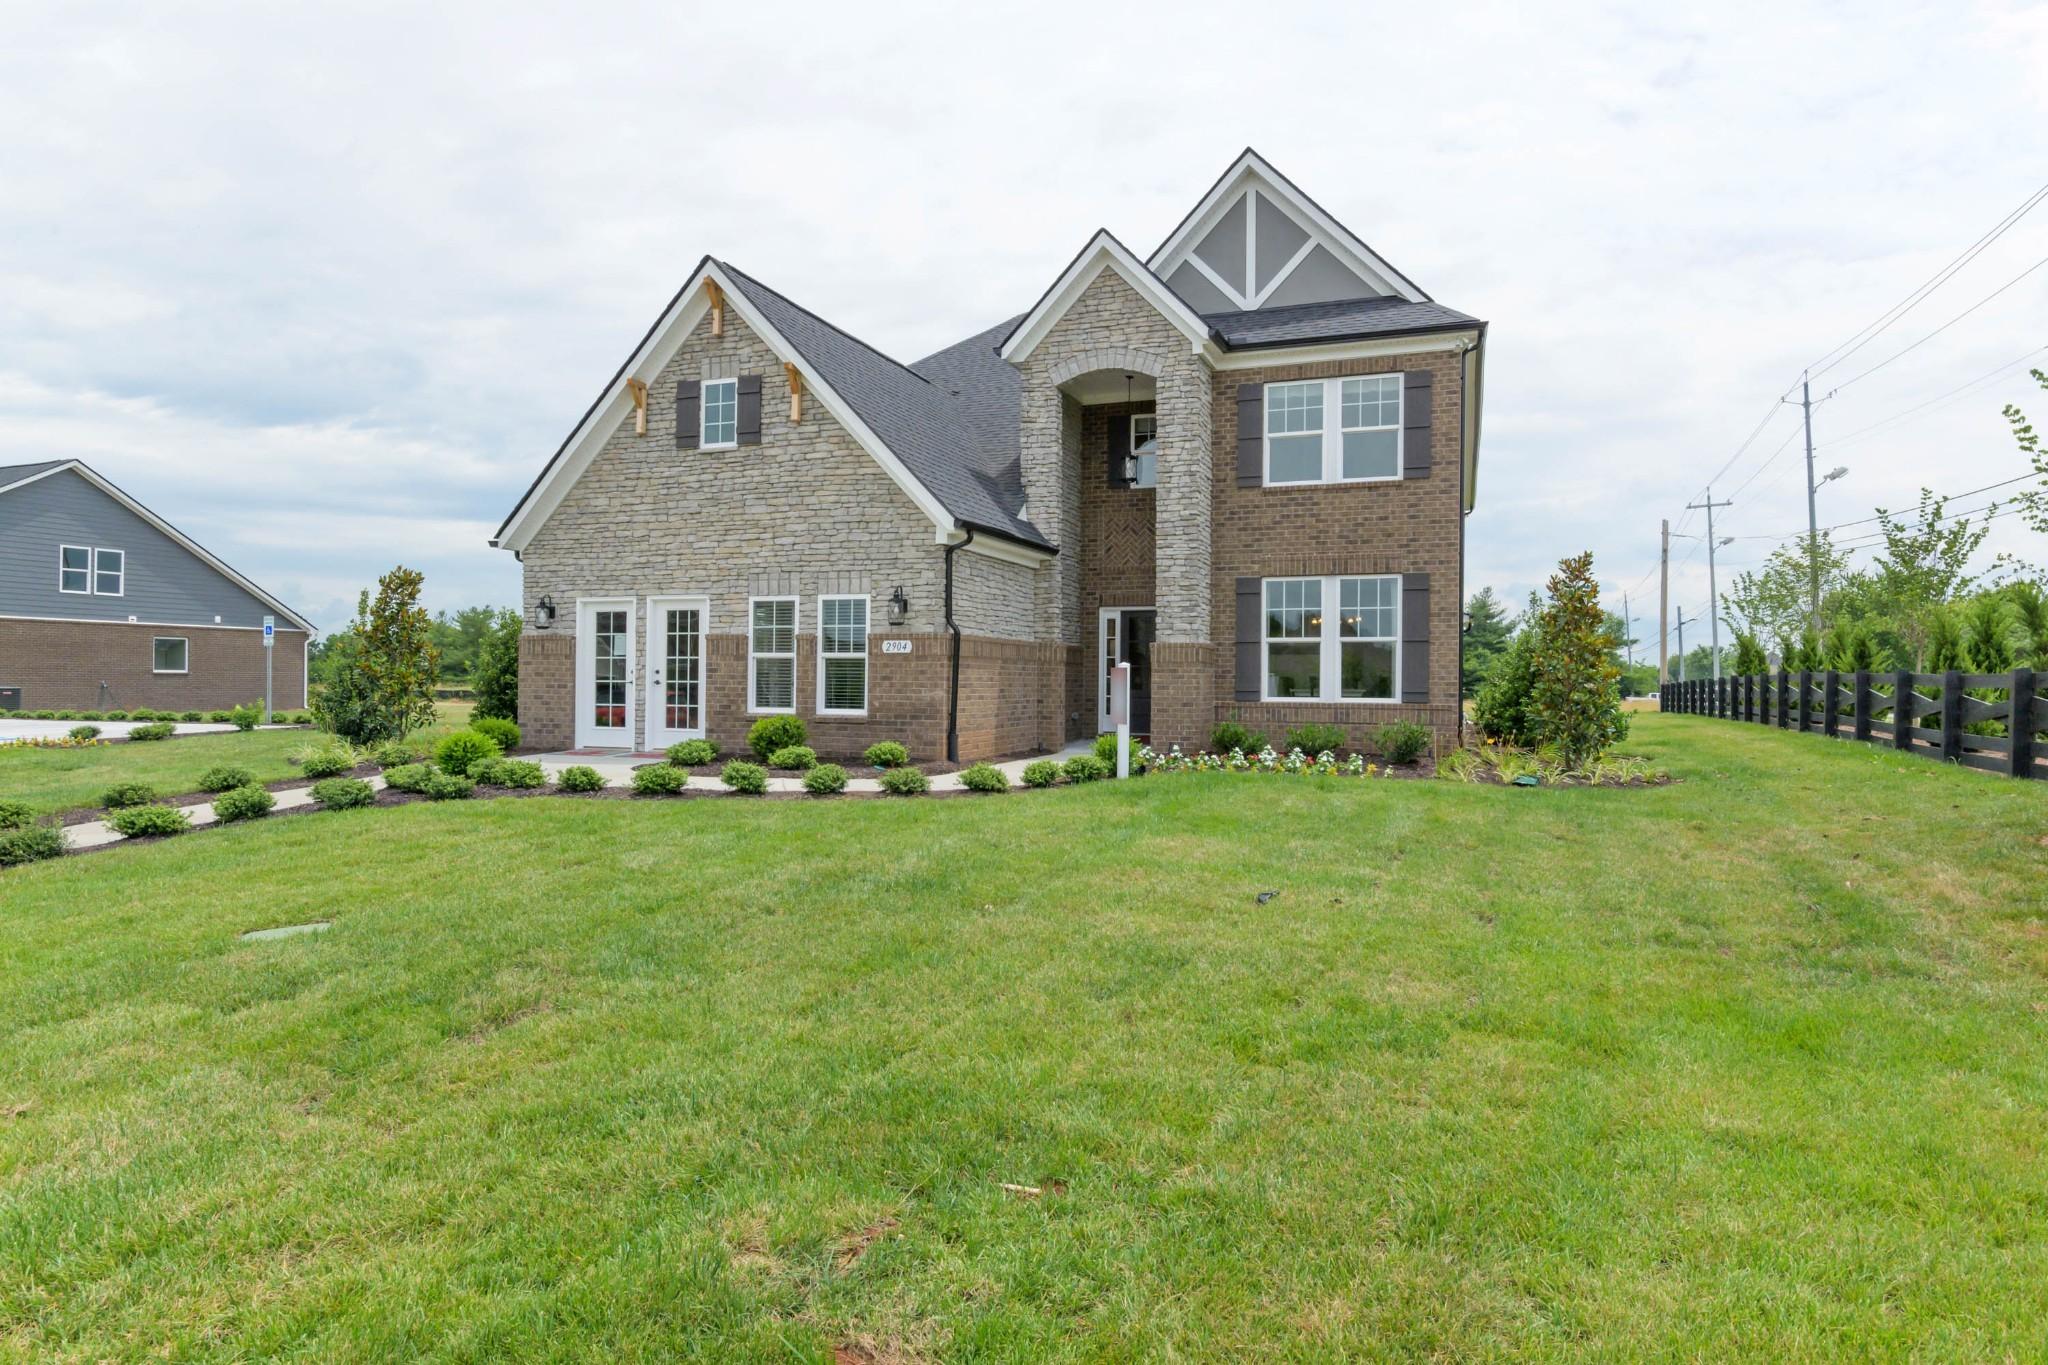 3013 Pomoa Pl Property Photo - Murfreesboro, TN real estate listing